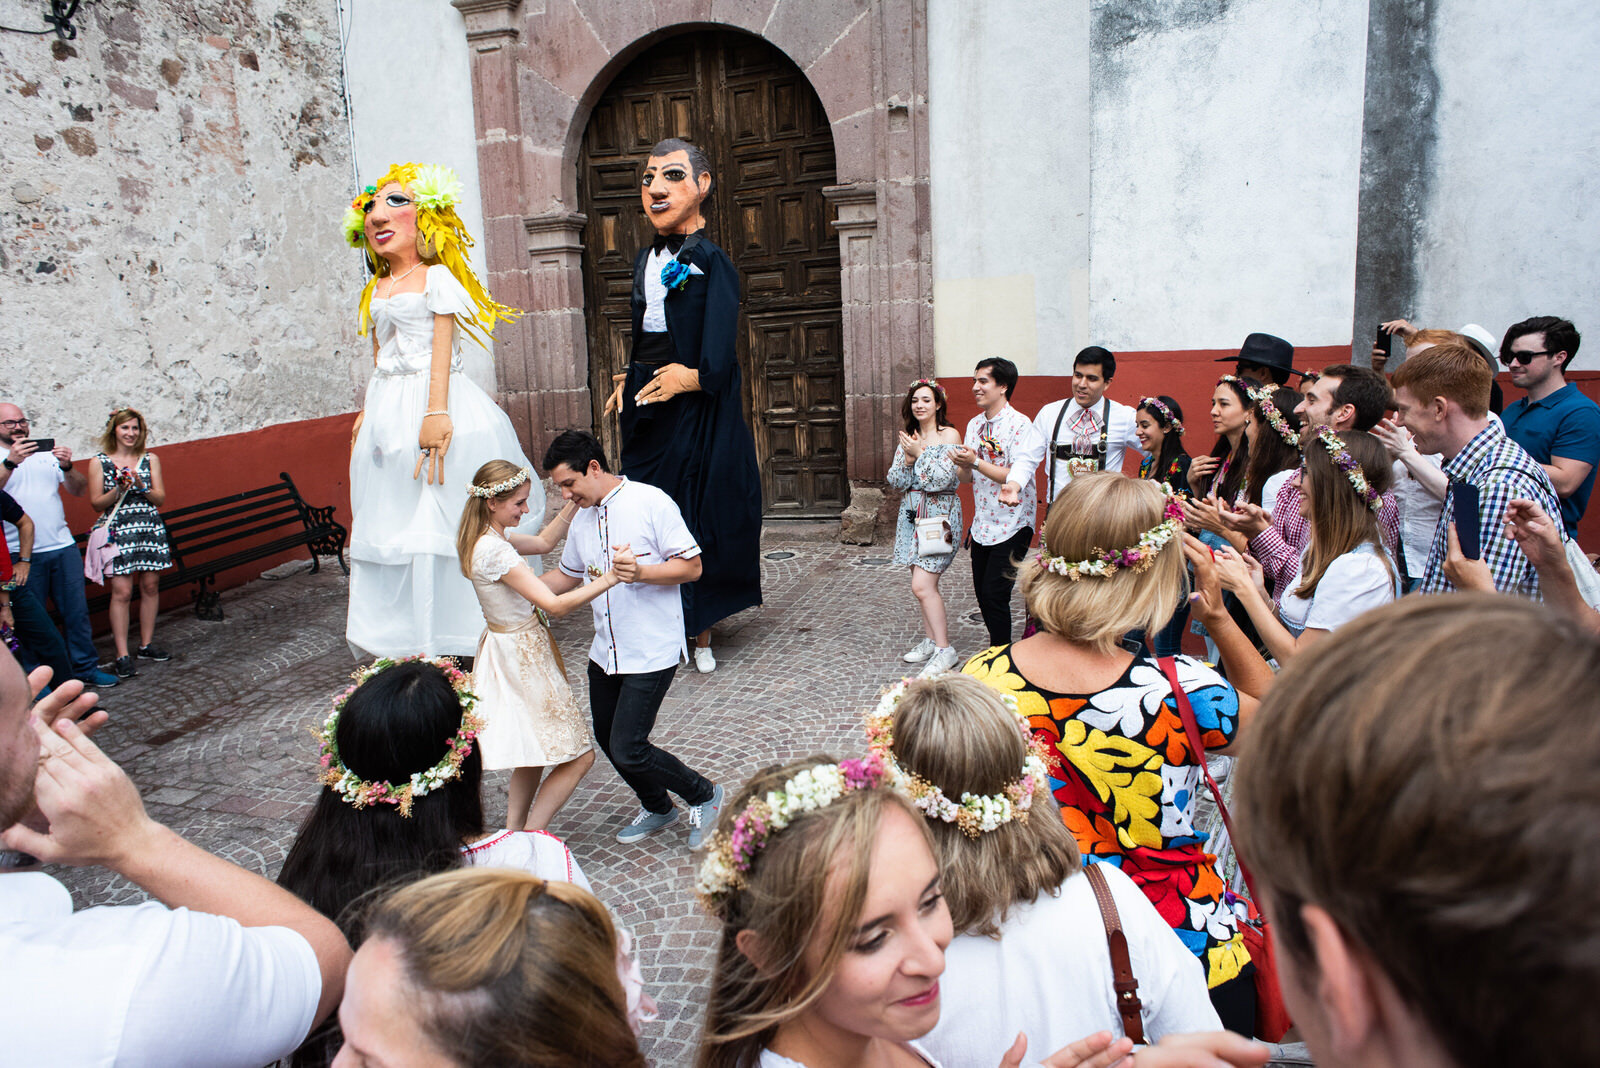 callejoneada_san_miguel_de_allende_wedding_photography_ (9).jpg